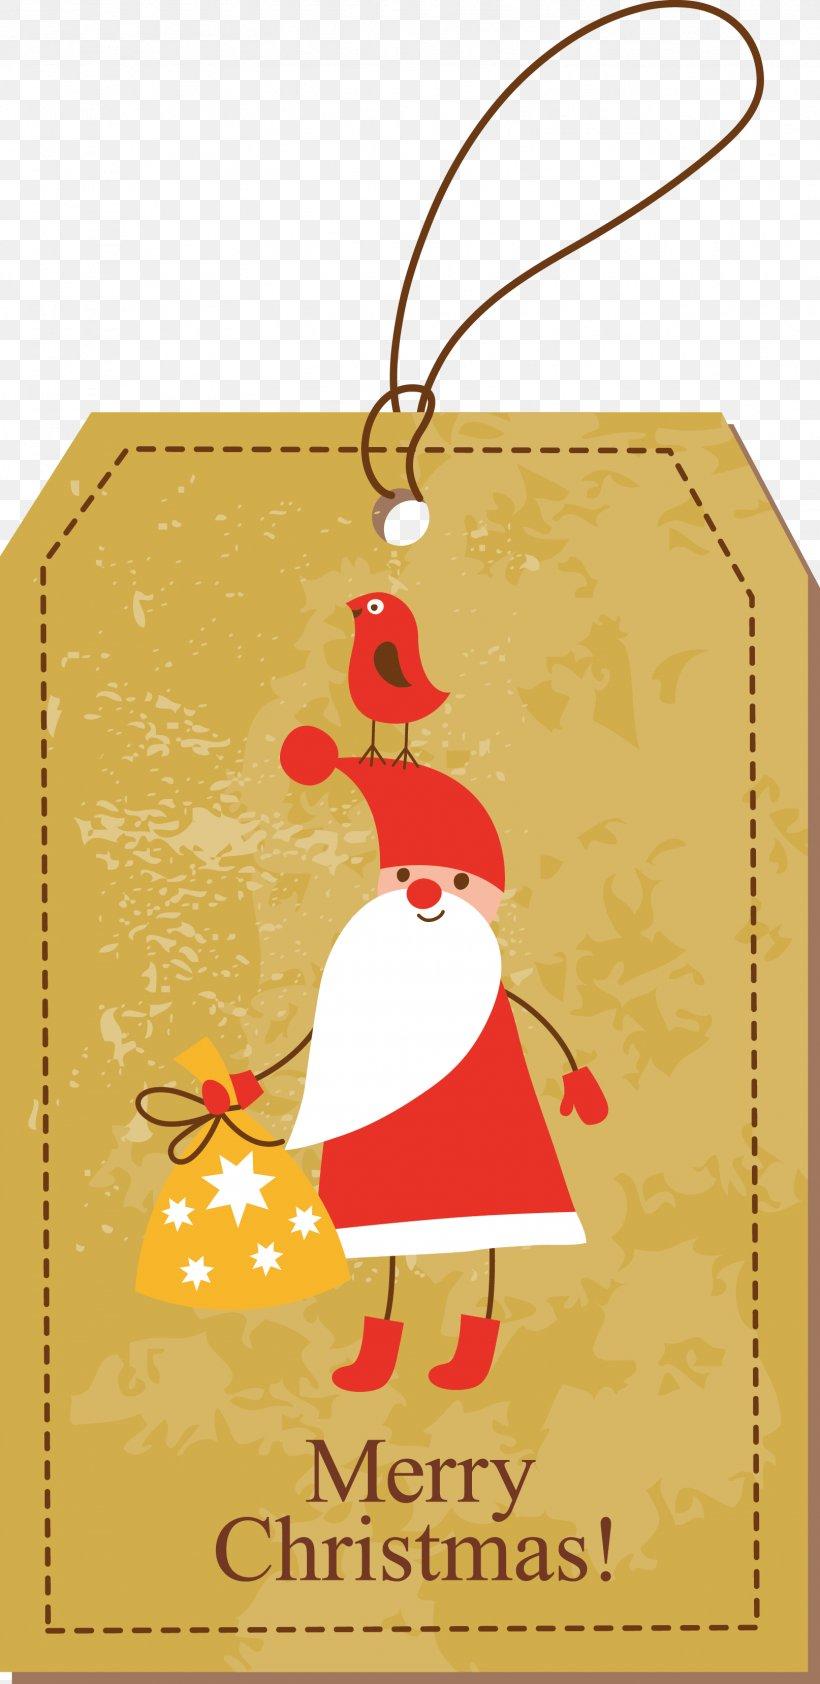 Christmas Gift Christmas Gift Santa Claus Christmas Decoration, PNG, 1614x3315px, Santa Claus, Art, Bookmark, Christmas, Christmas Decoration Download Free